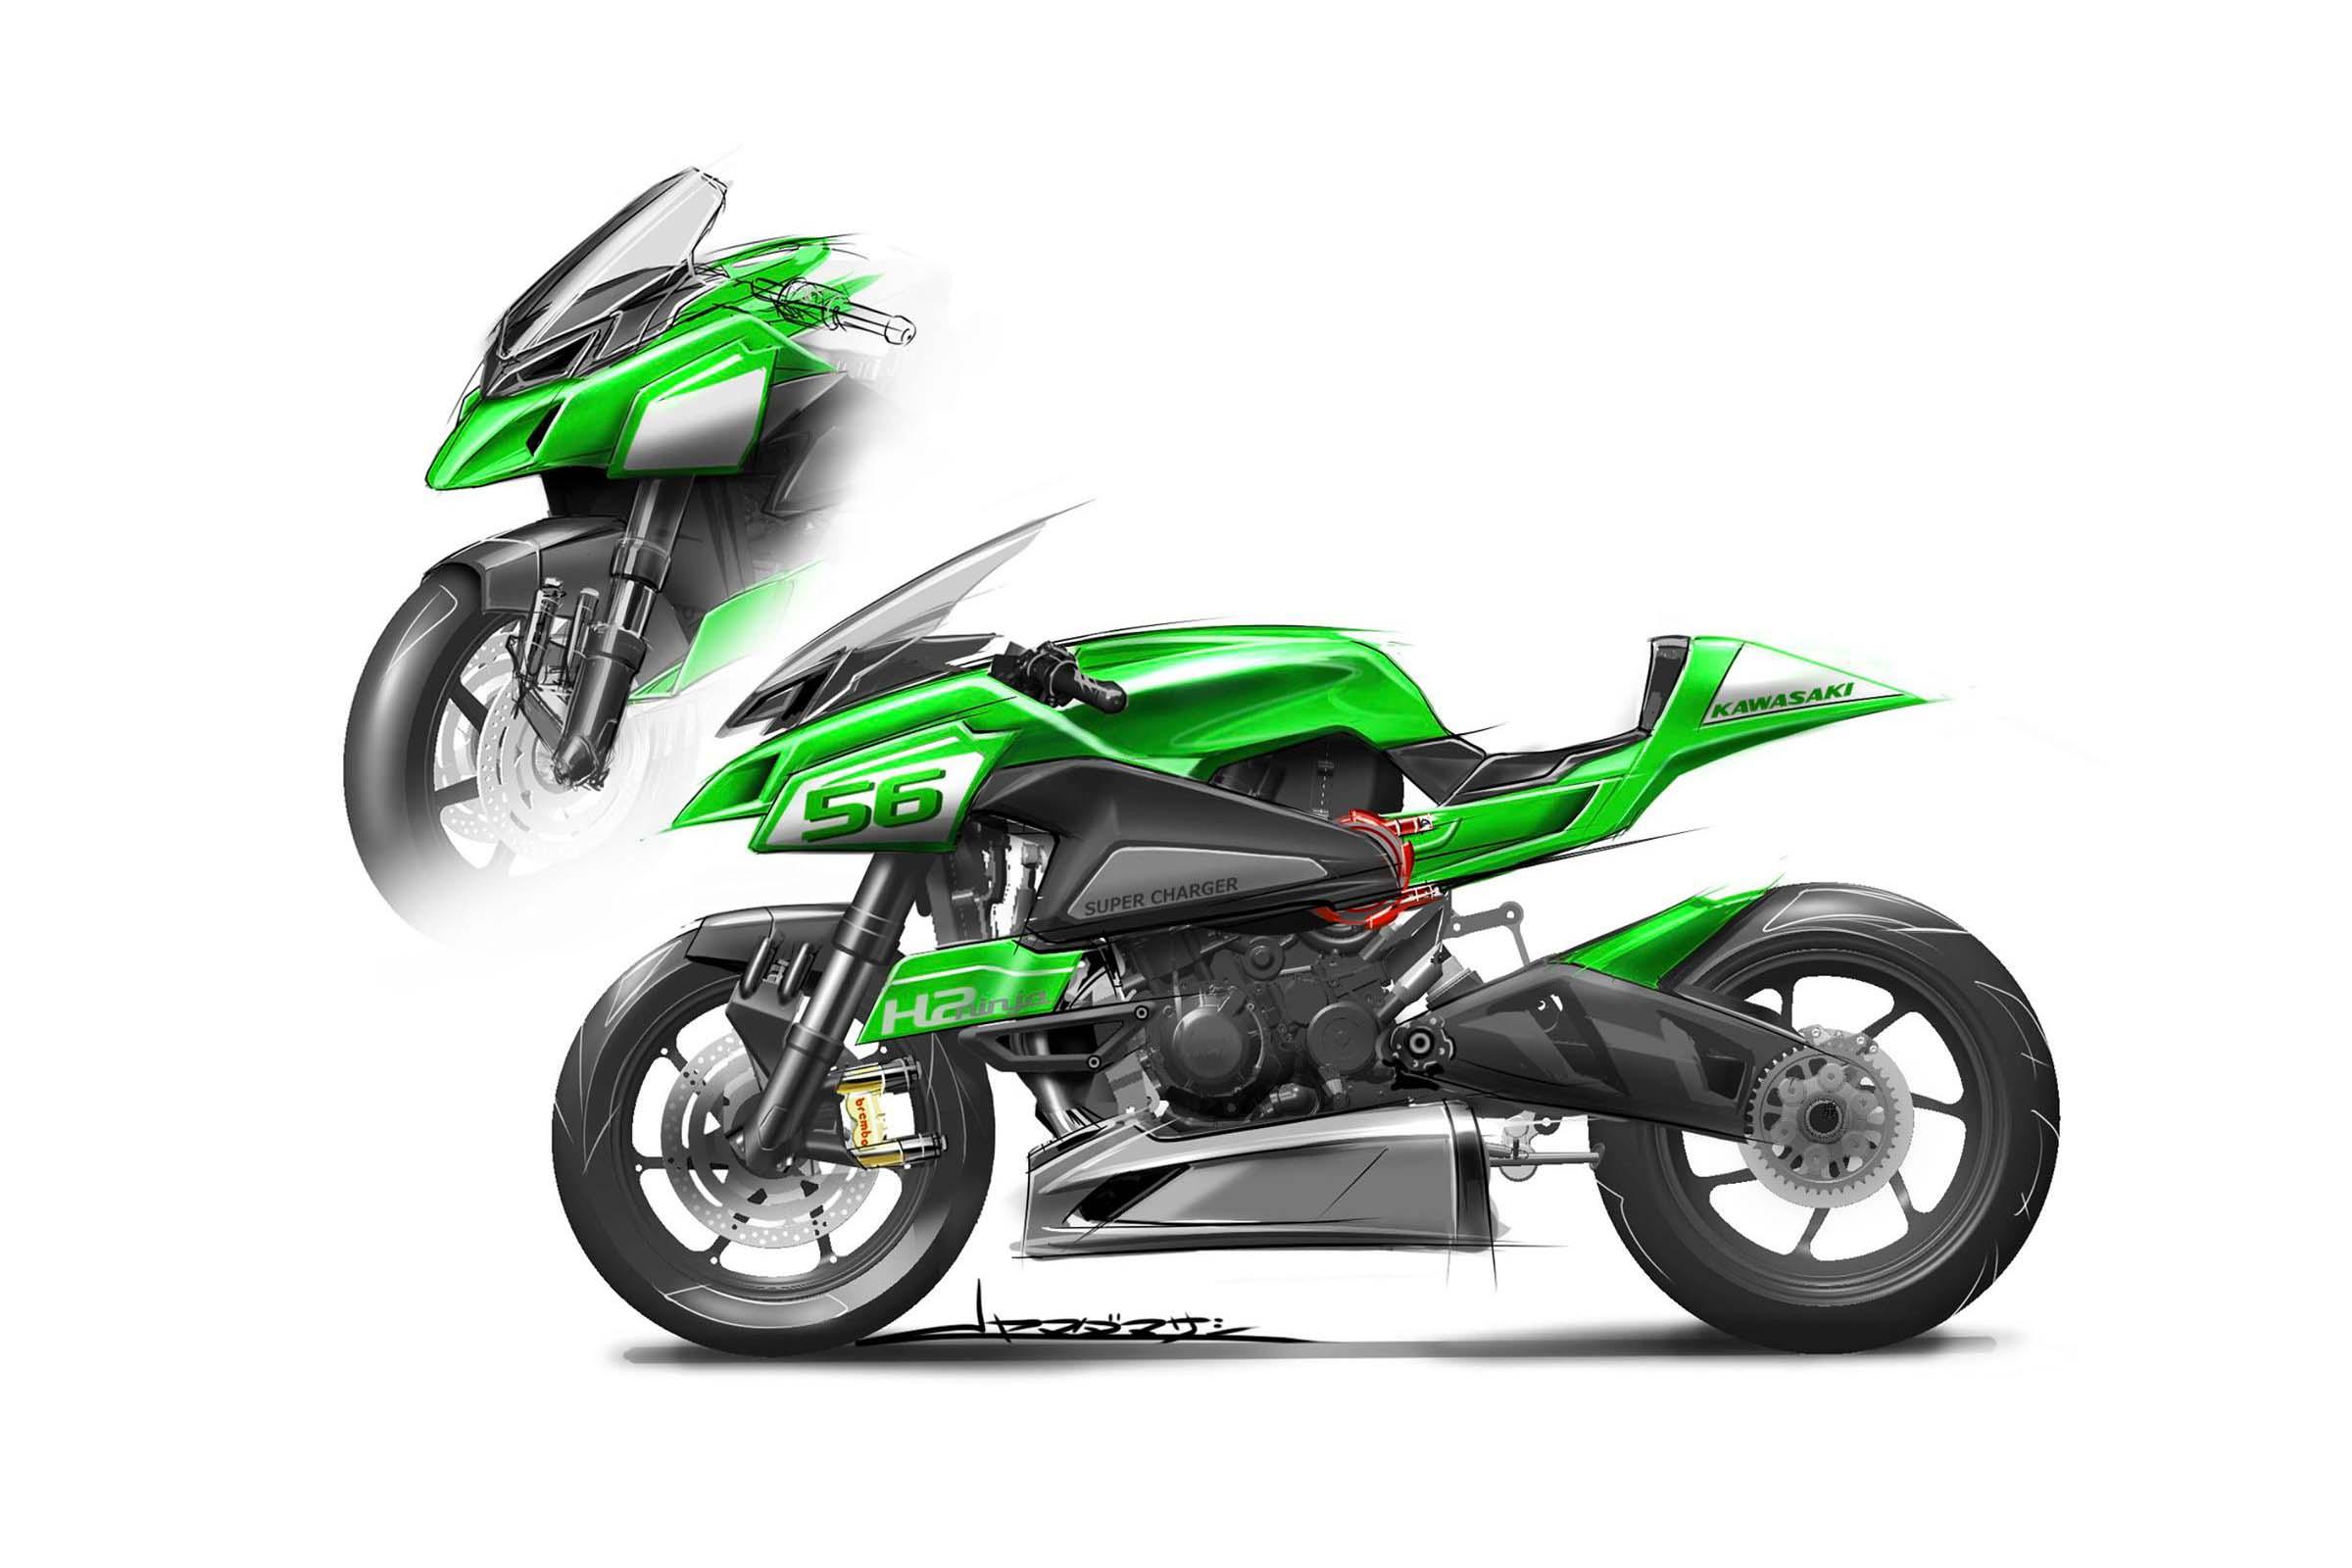 Kawasaki Dual Sport >> Kawasaki Ninja H2 Archives - Asphalt & Rubber